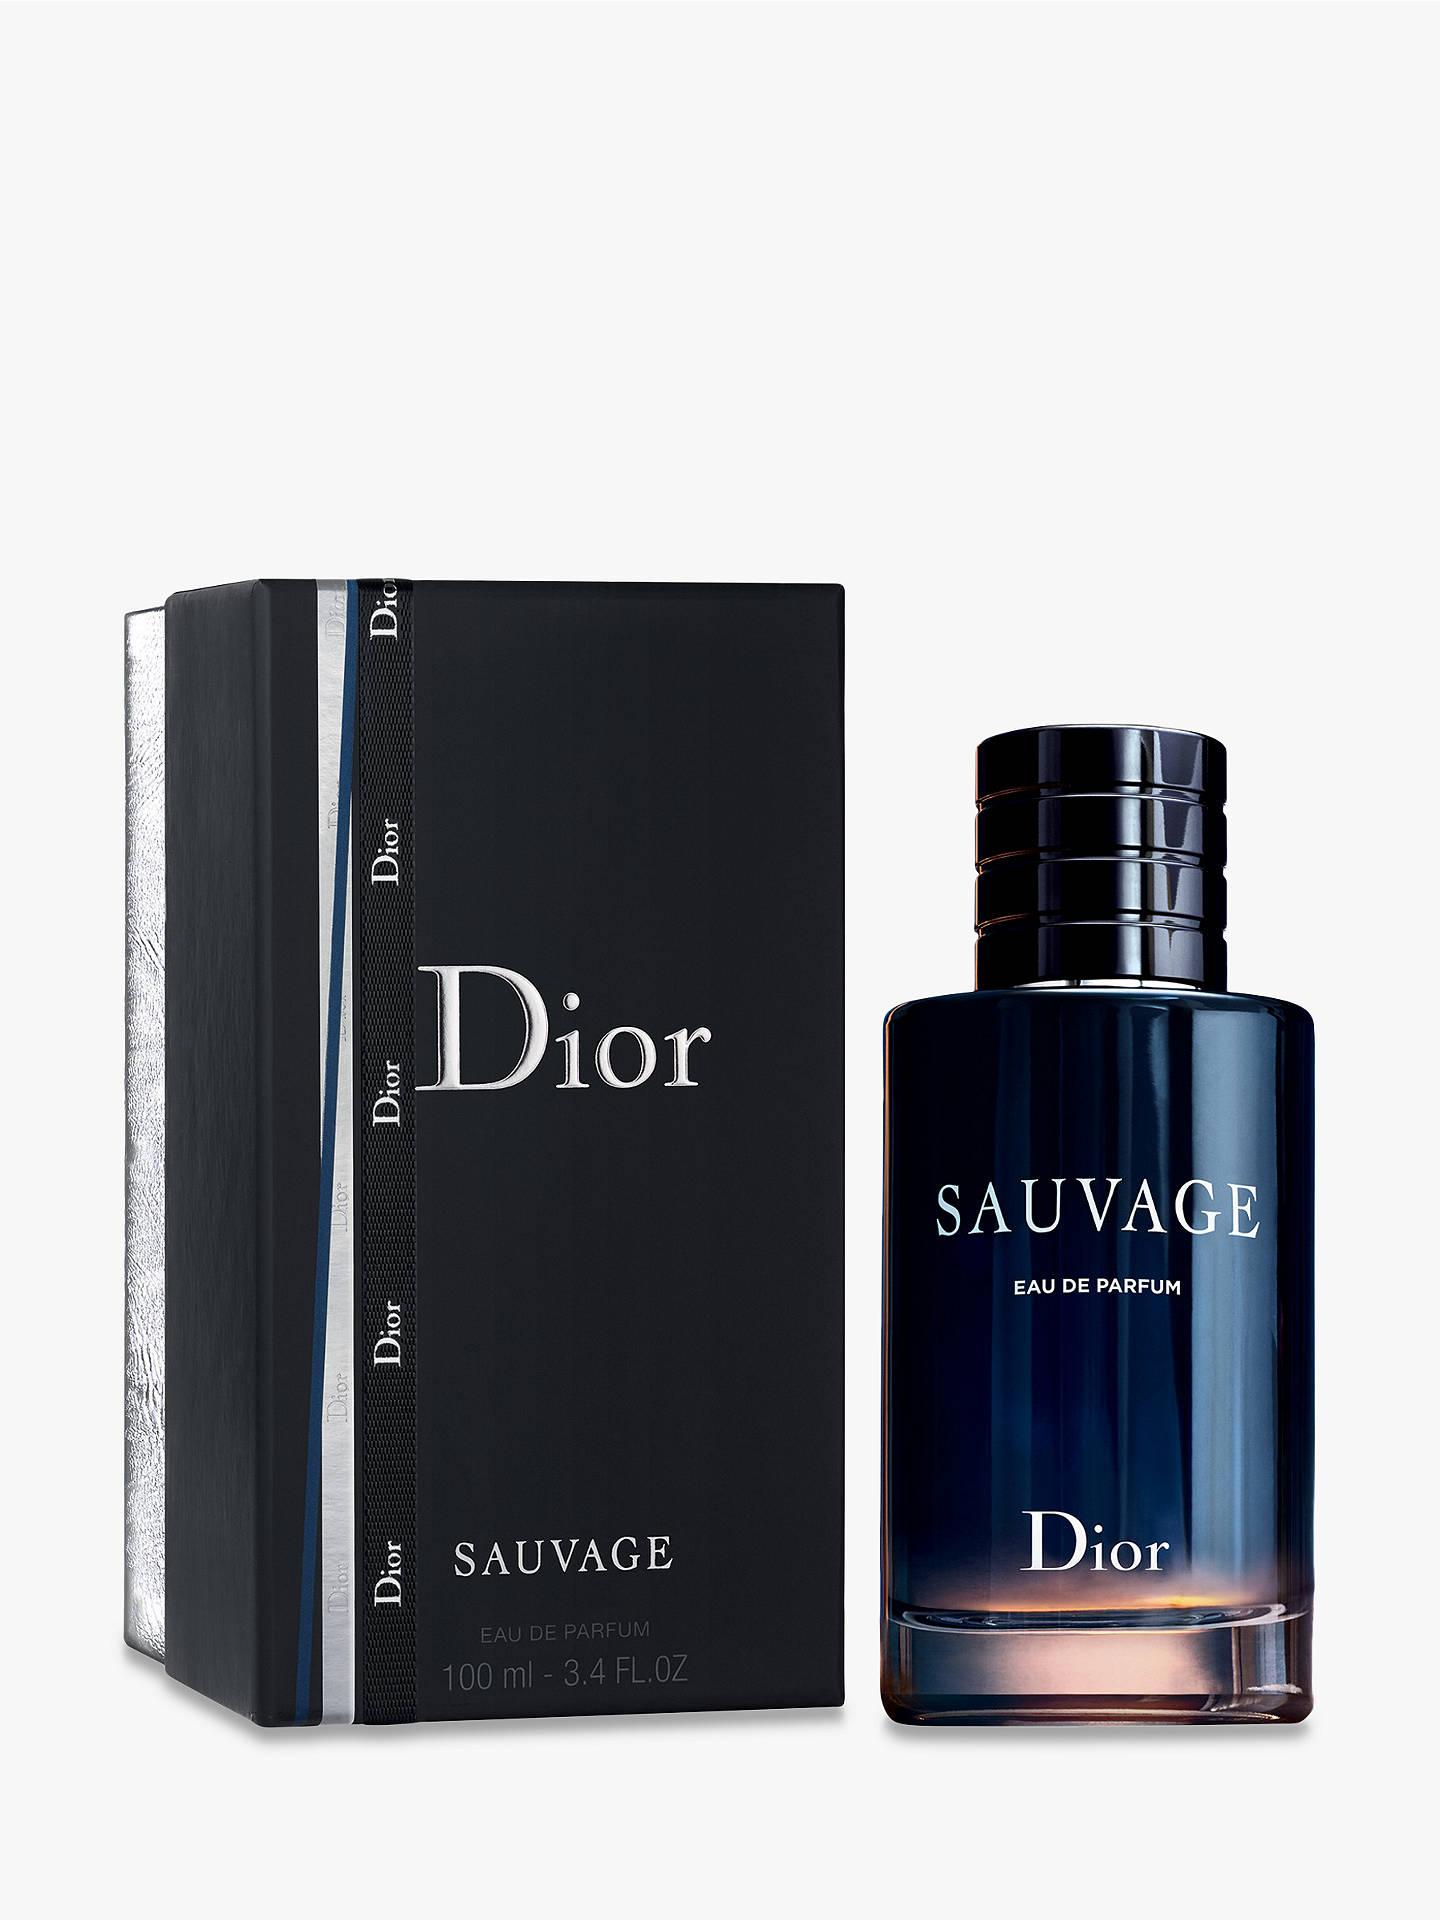 Dior Sauvage Eau De Parfum Gift Wrapped 100ml At John Lewis Partners